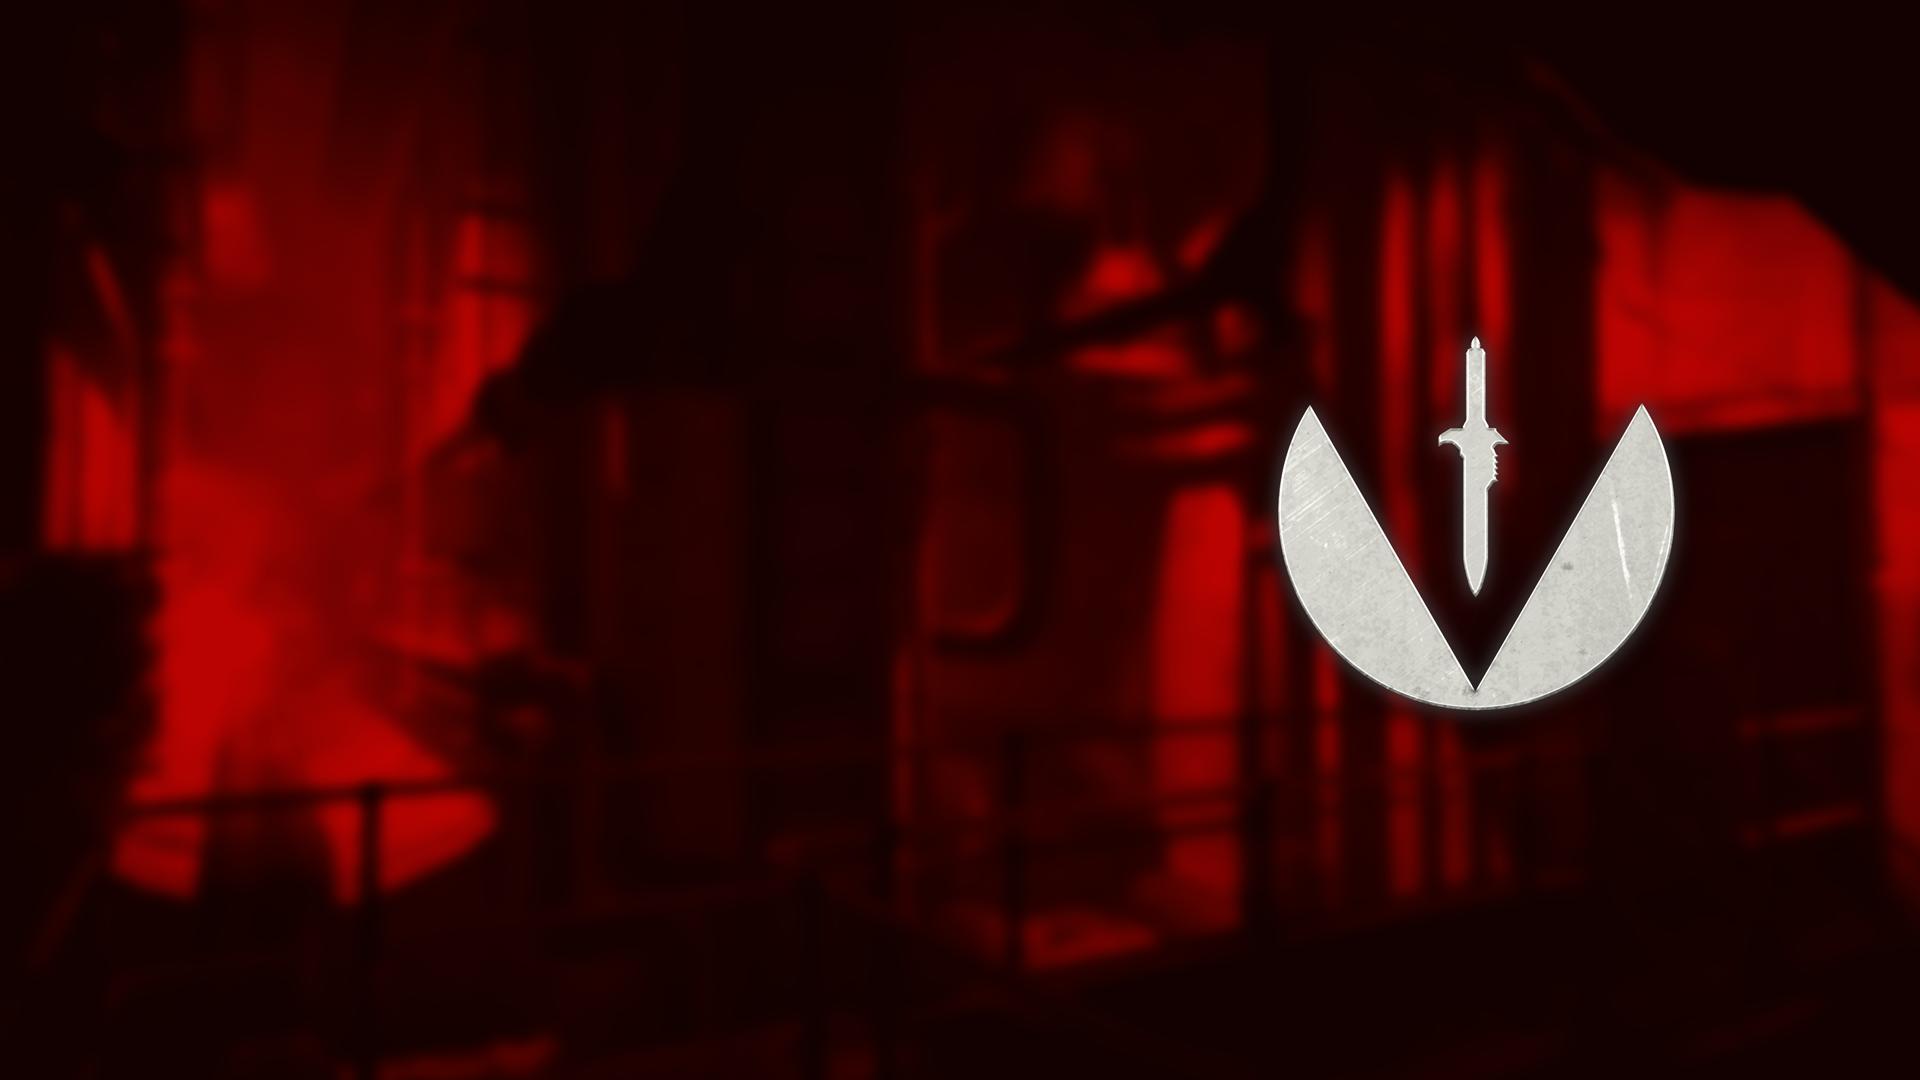 Knife sheath +